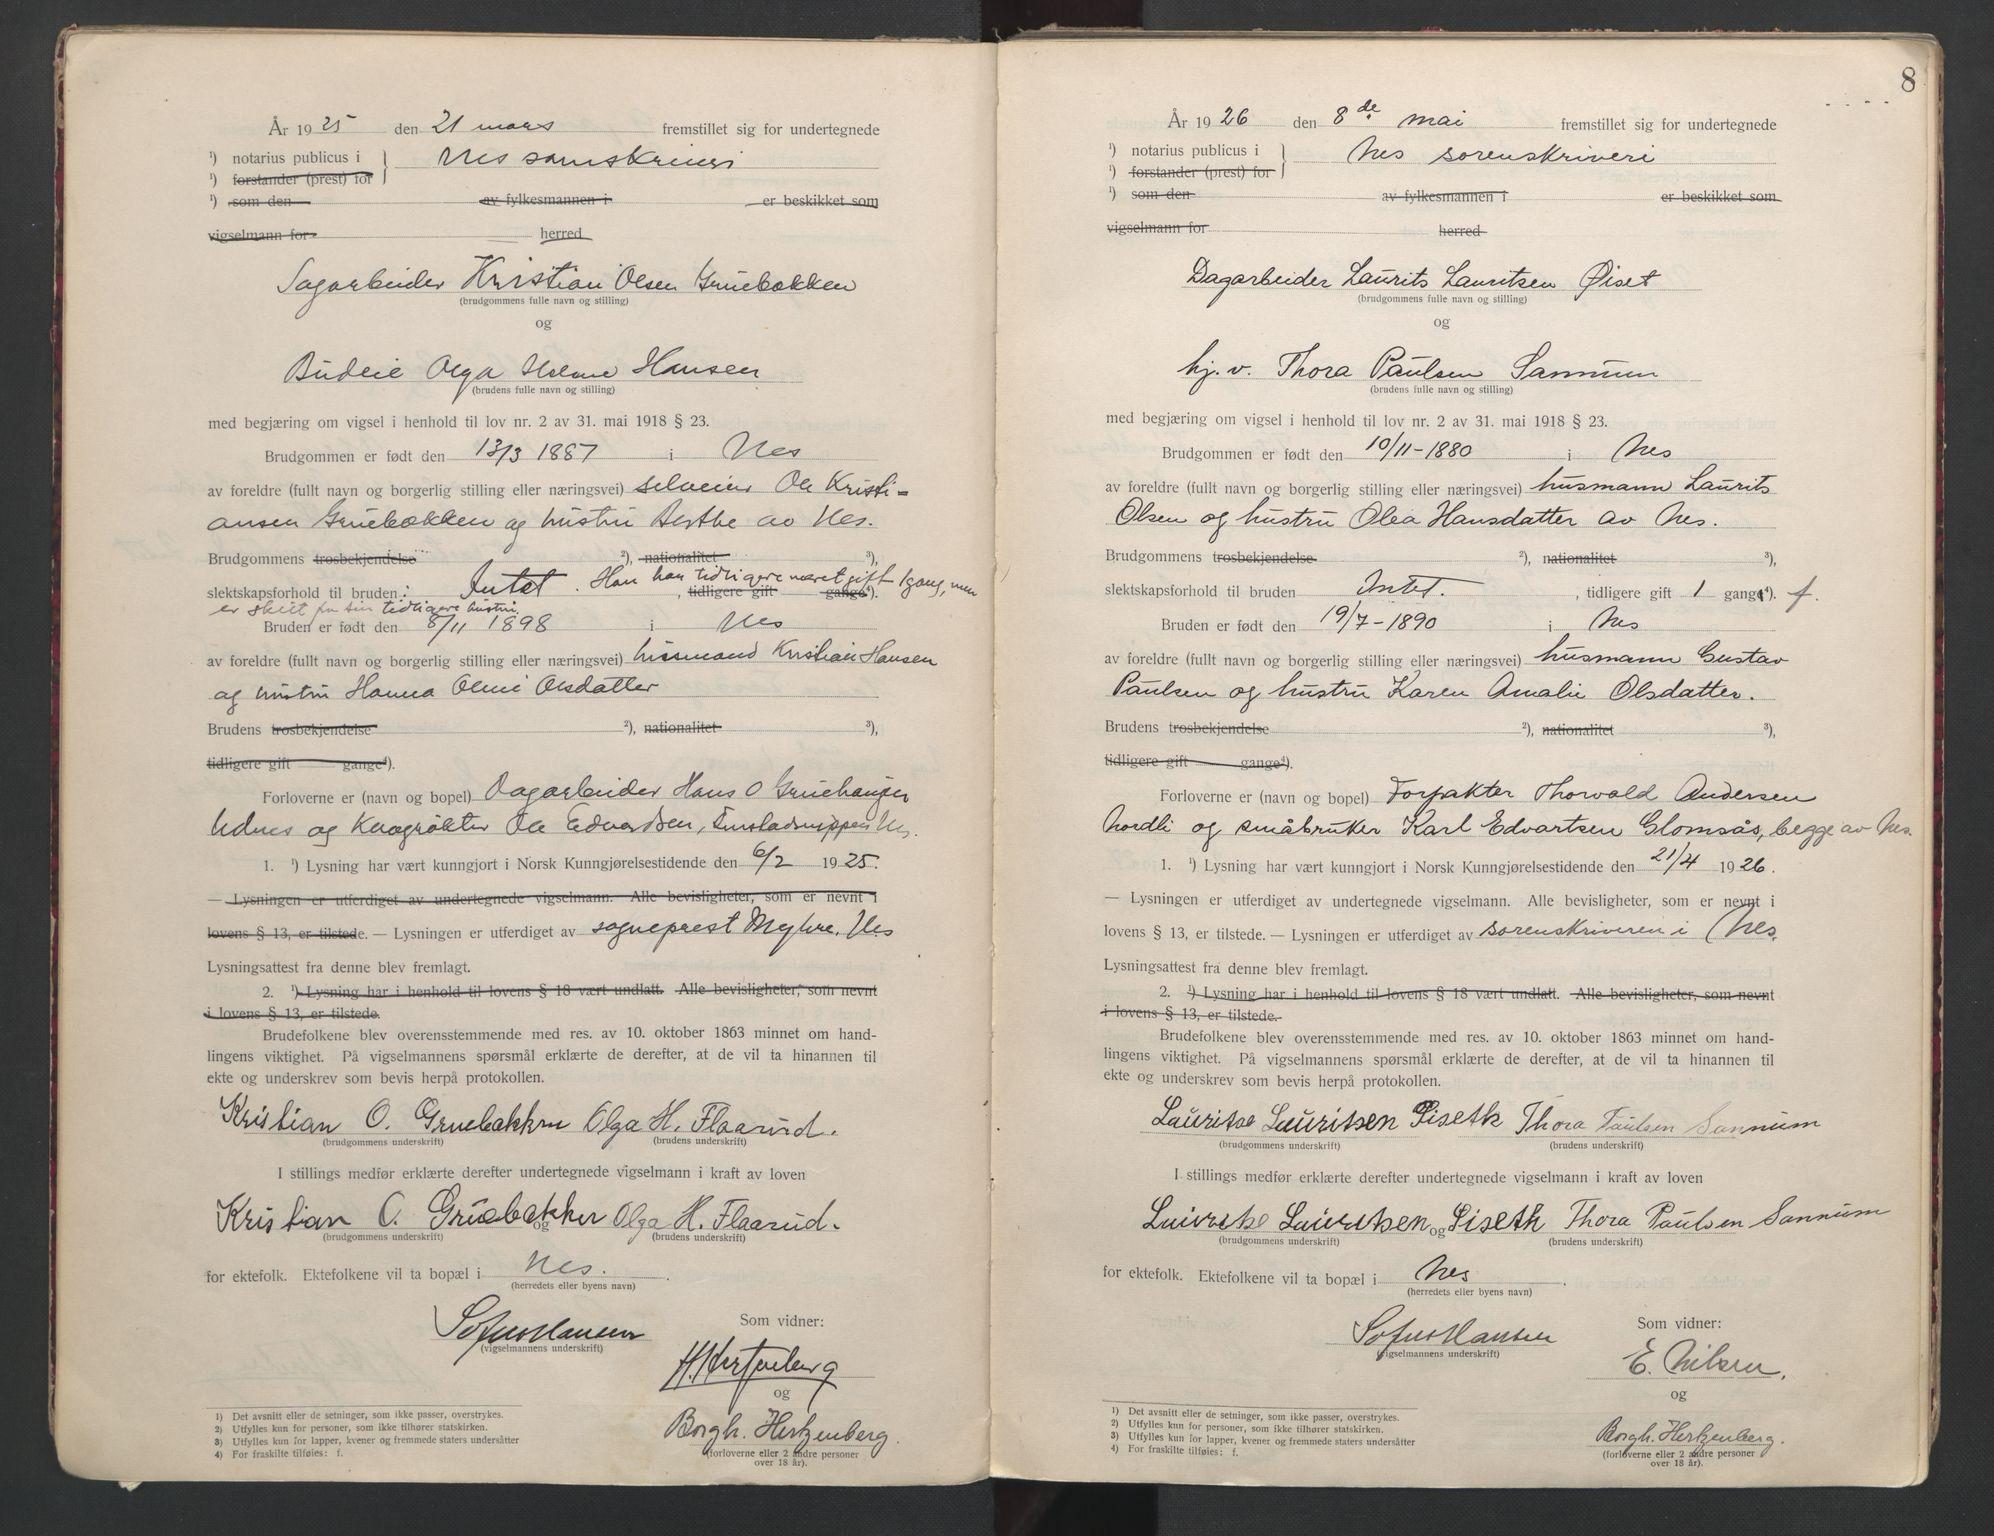 SAO, Nes tingrett, L/Lc/Lca/L0001: Vigselbok, 1920-1943, s. 8